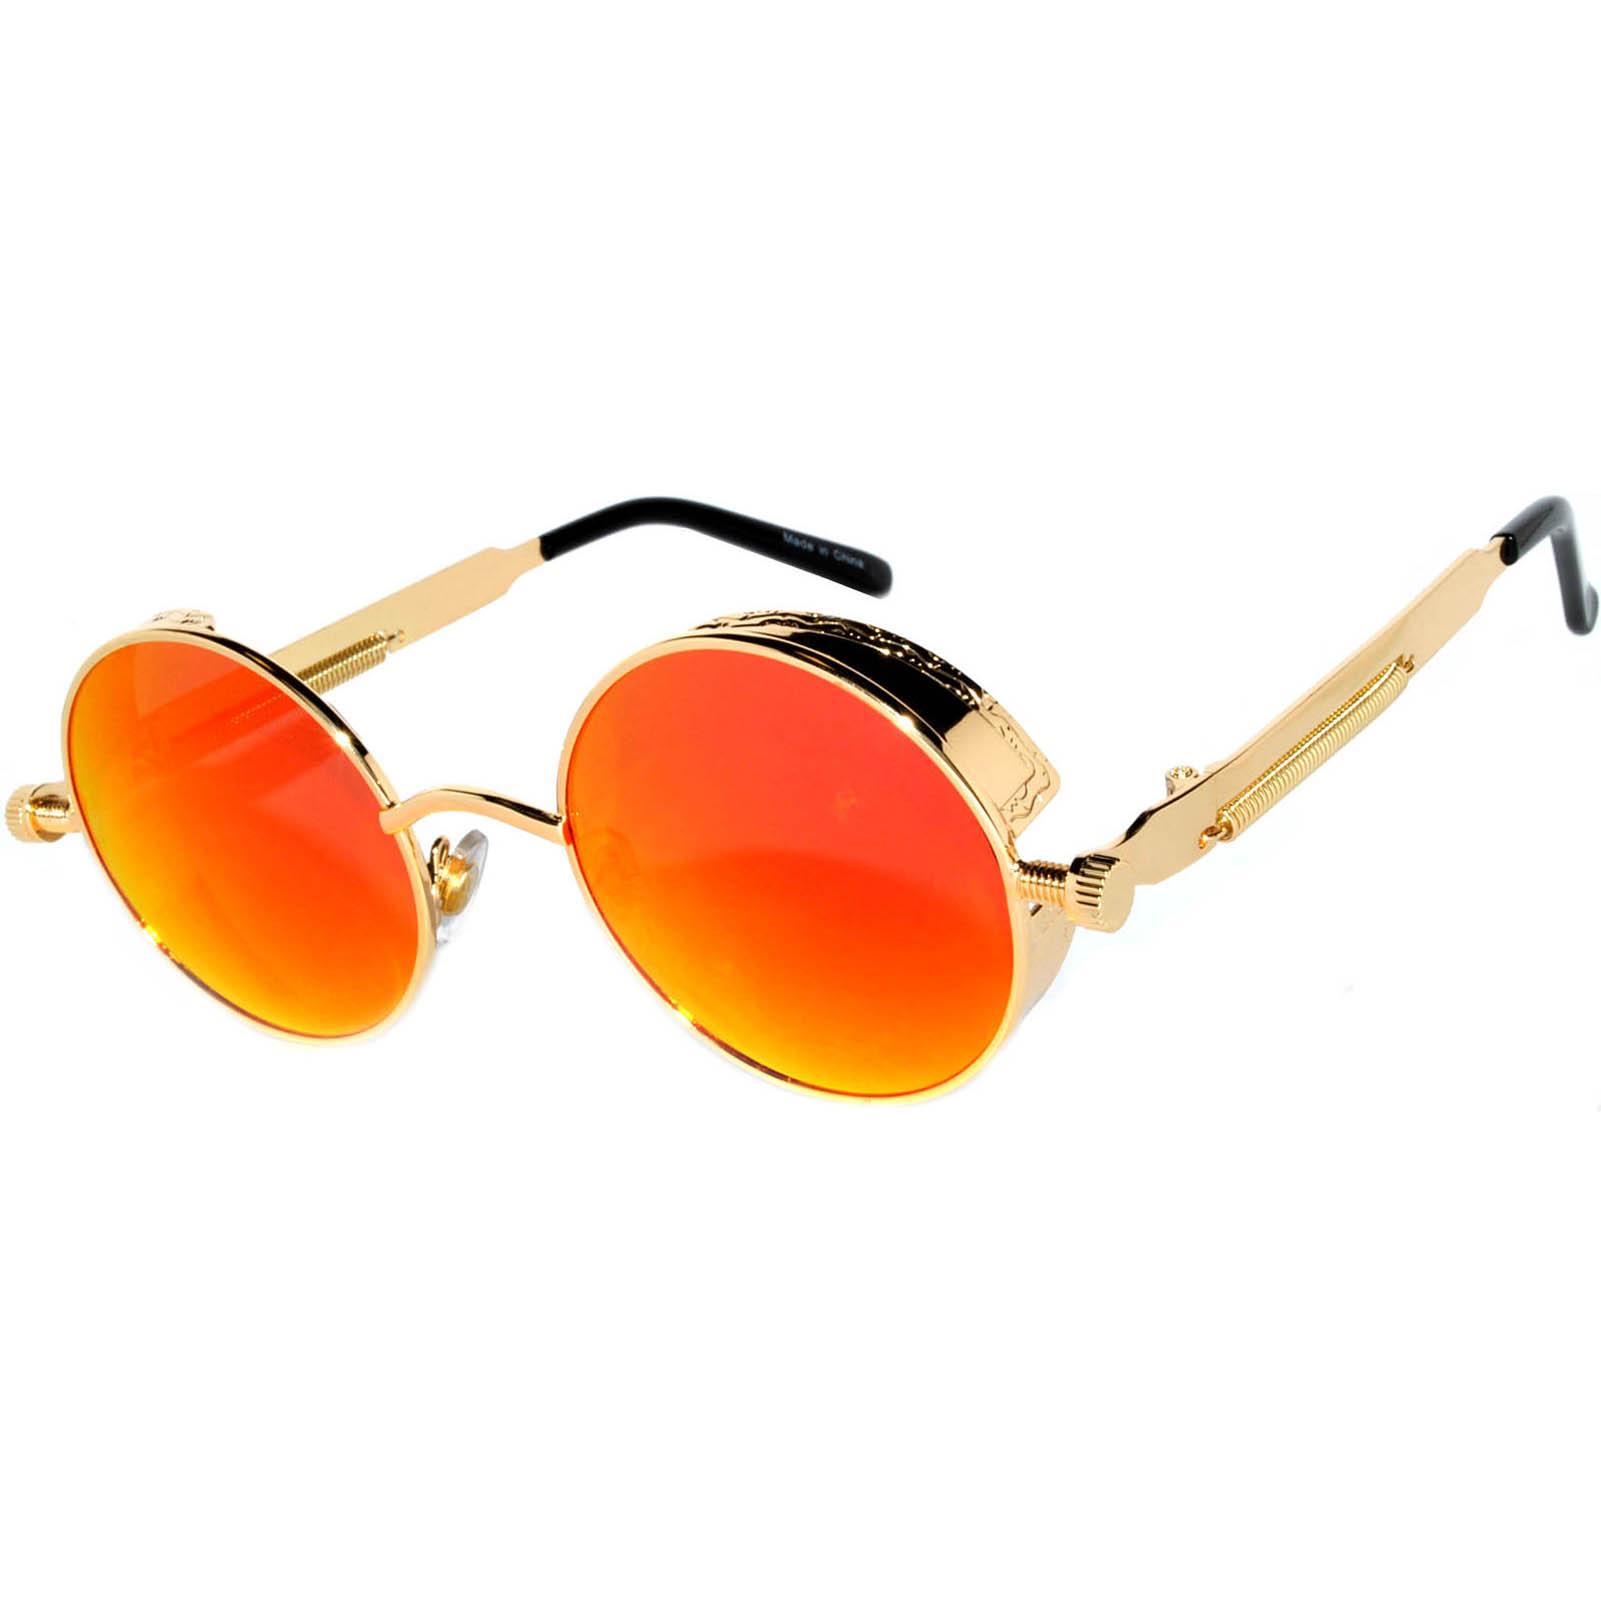 0a7a05b6fa1 060 C14 Steampunk Gothic Sunglasses Metal Round Circle Gold Frame Orange  Red Mirror Lens ...